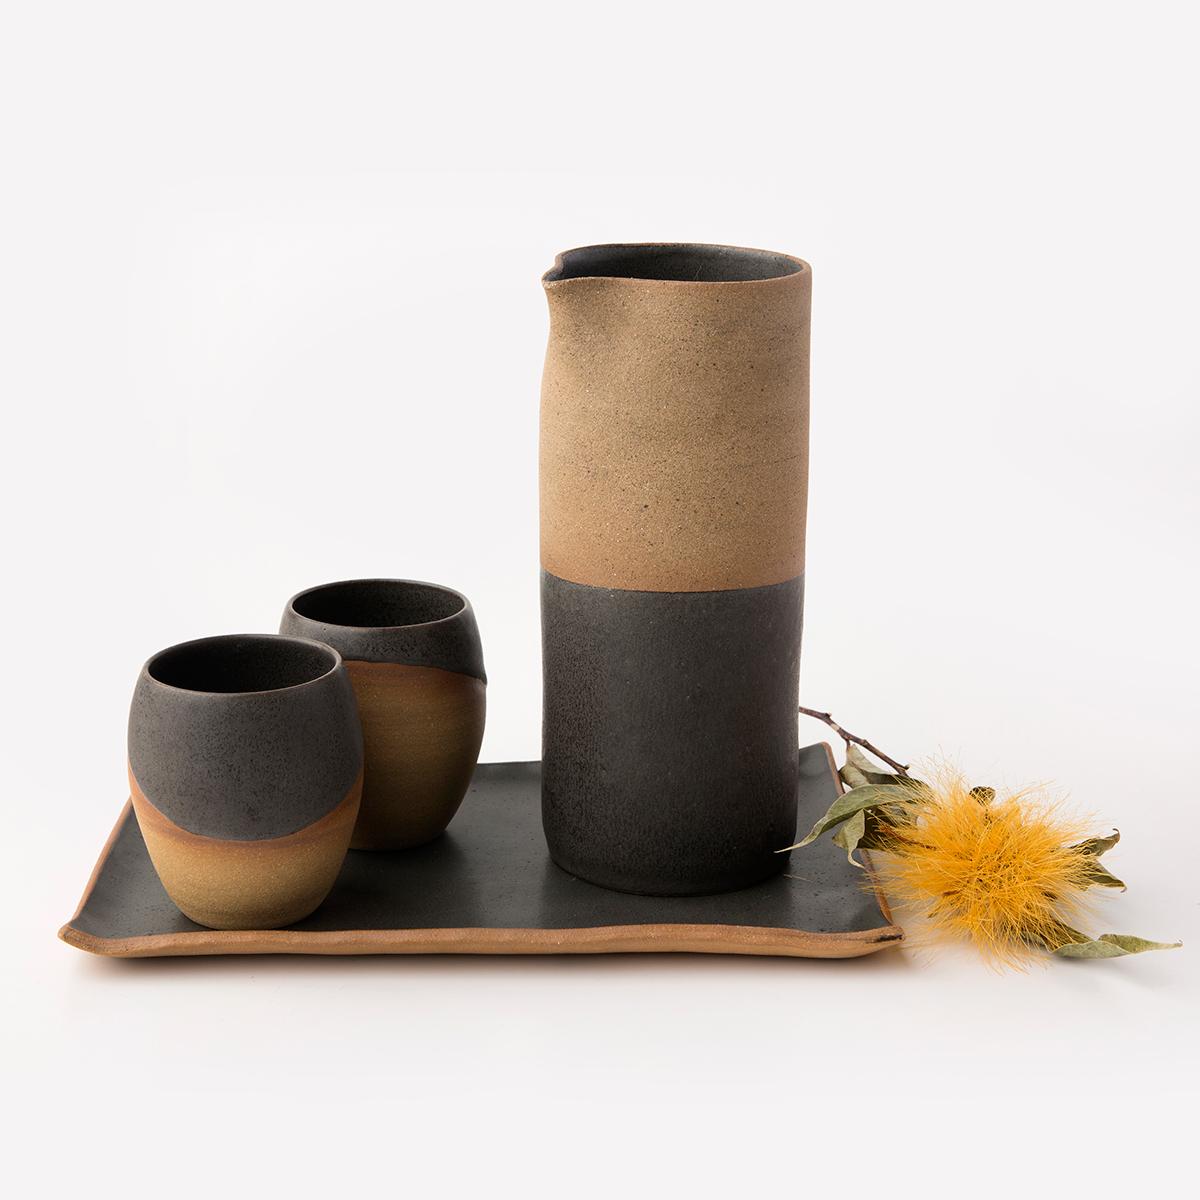 Conjunto: Jarra + 2 Copos Tulipa + Travessa Retangular M. Cor: preto e argila natural